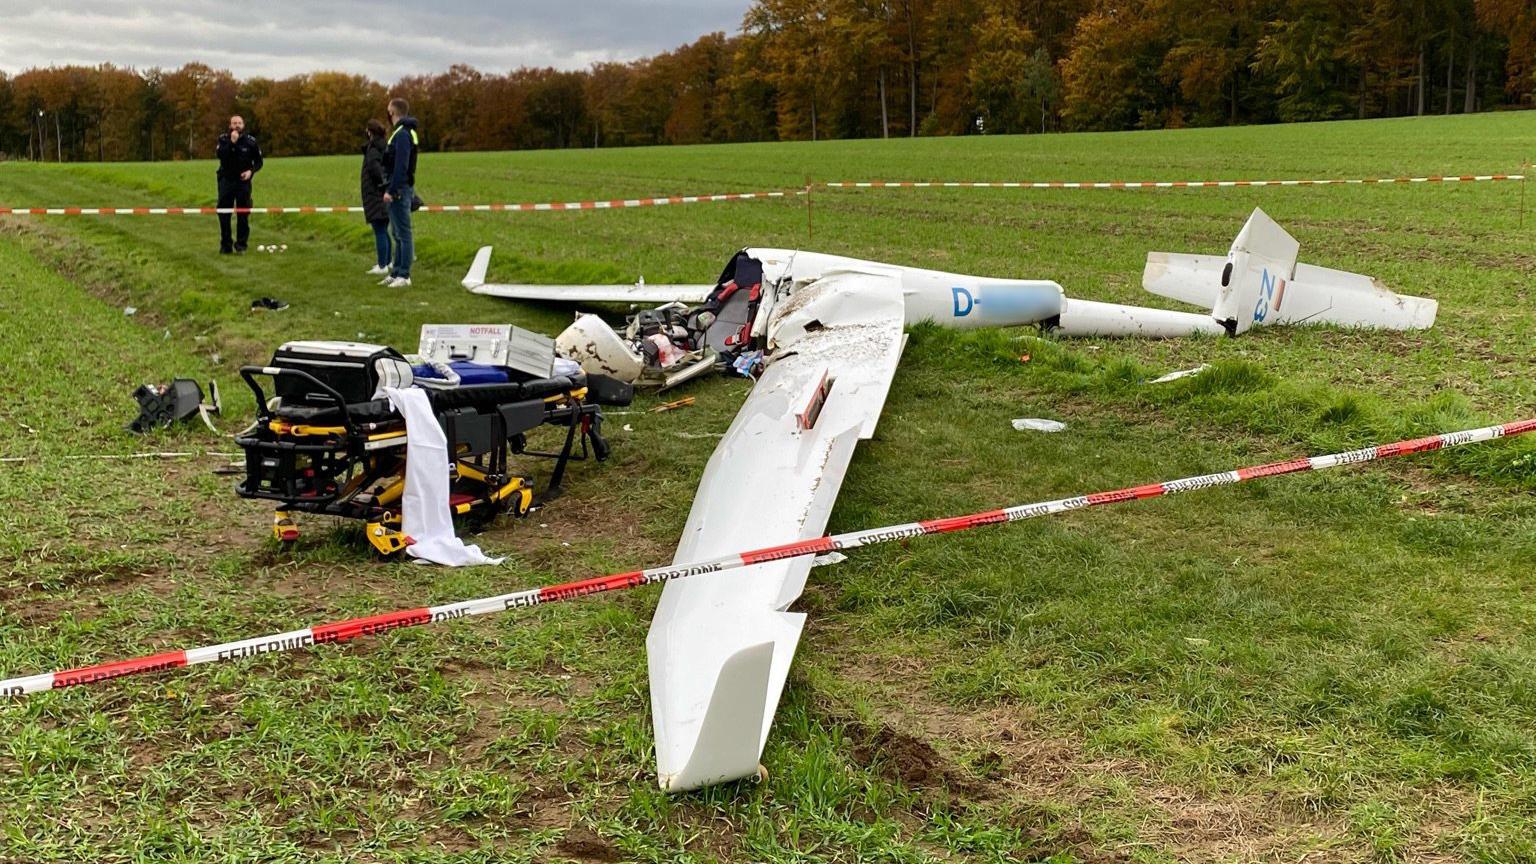 27-Jähriger stürzt mit Segelflugzeug ab